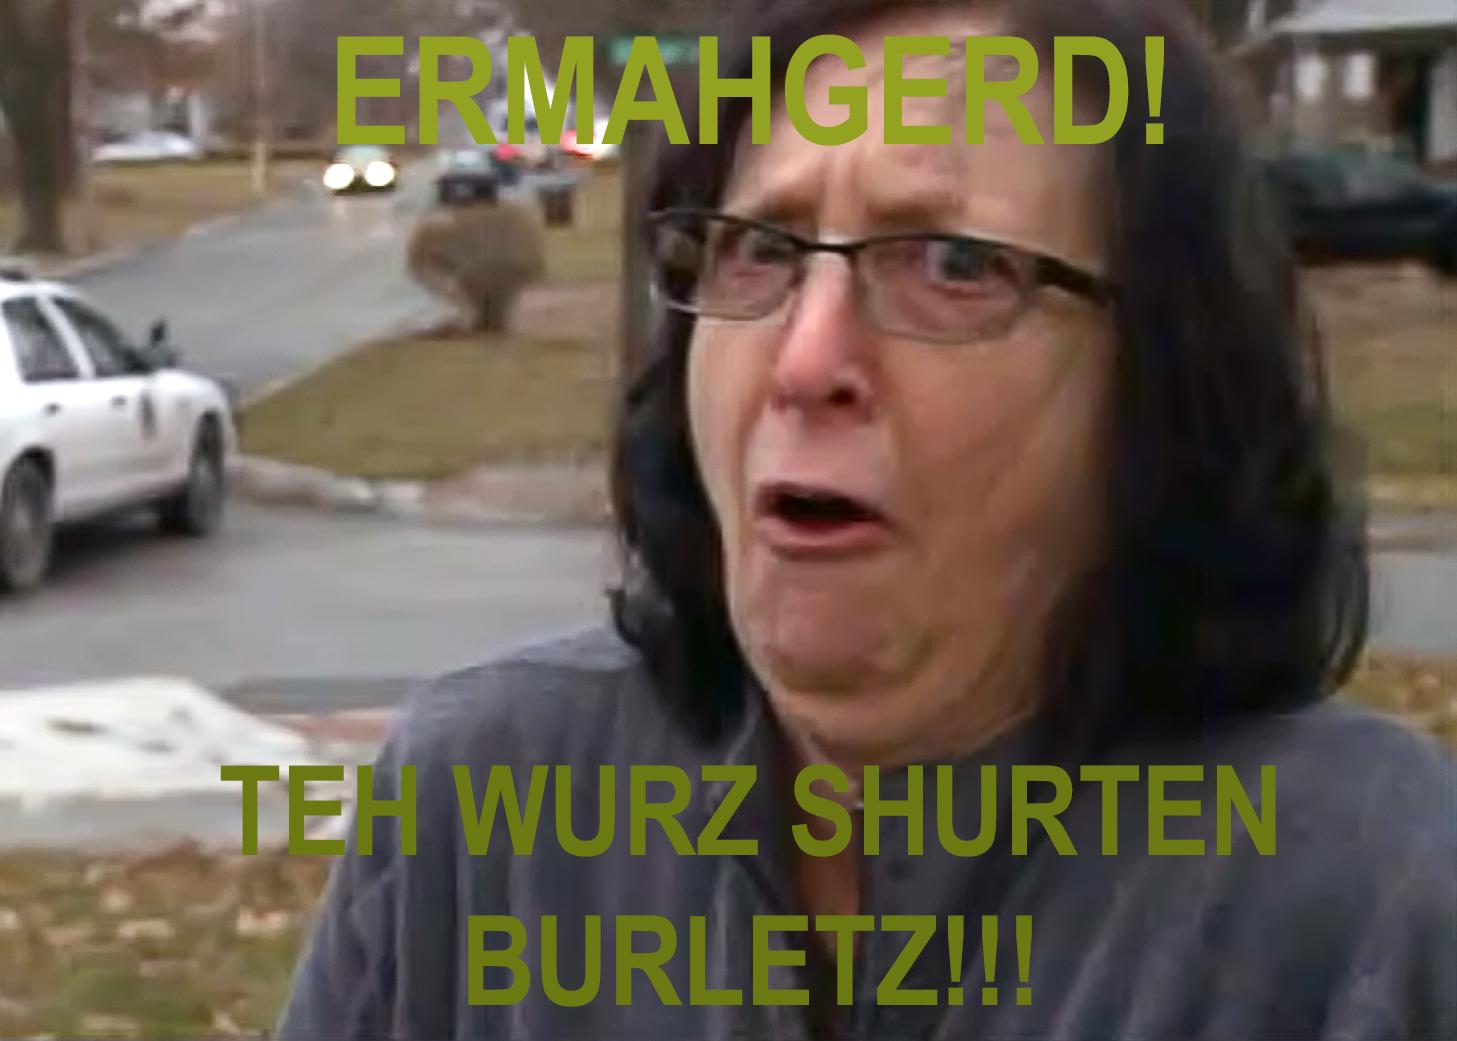 76f ermahgerd shurten burletz ermahgerd know your meme